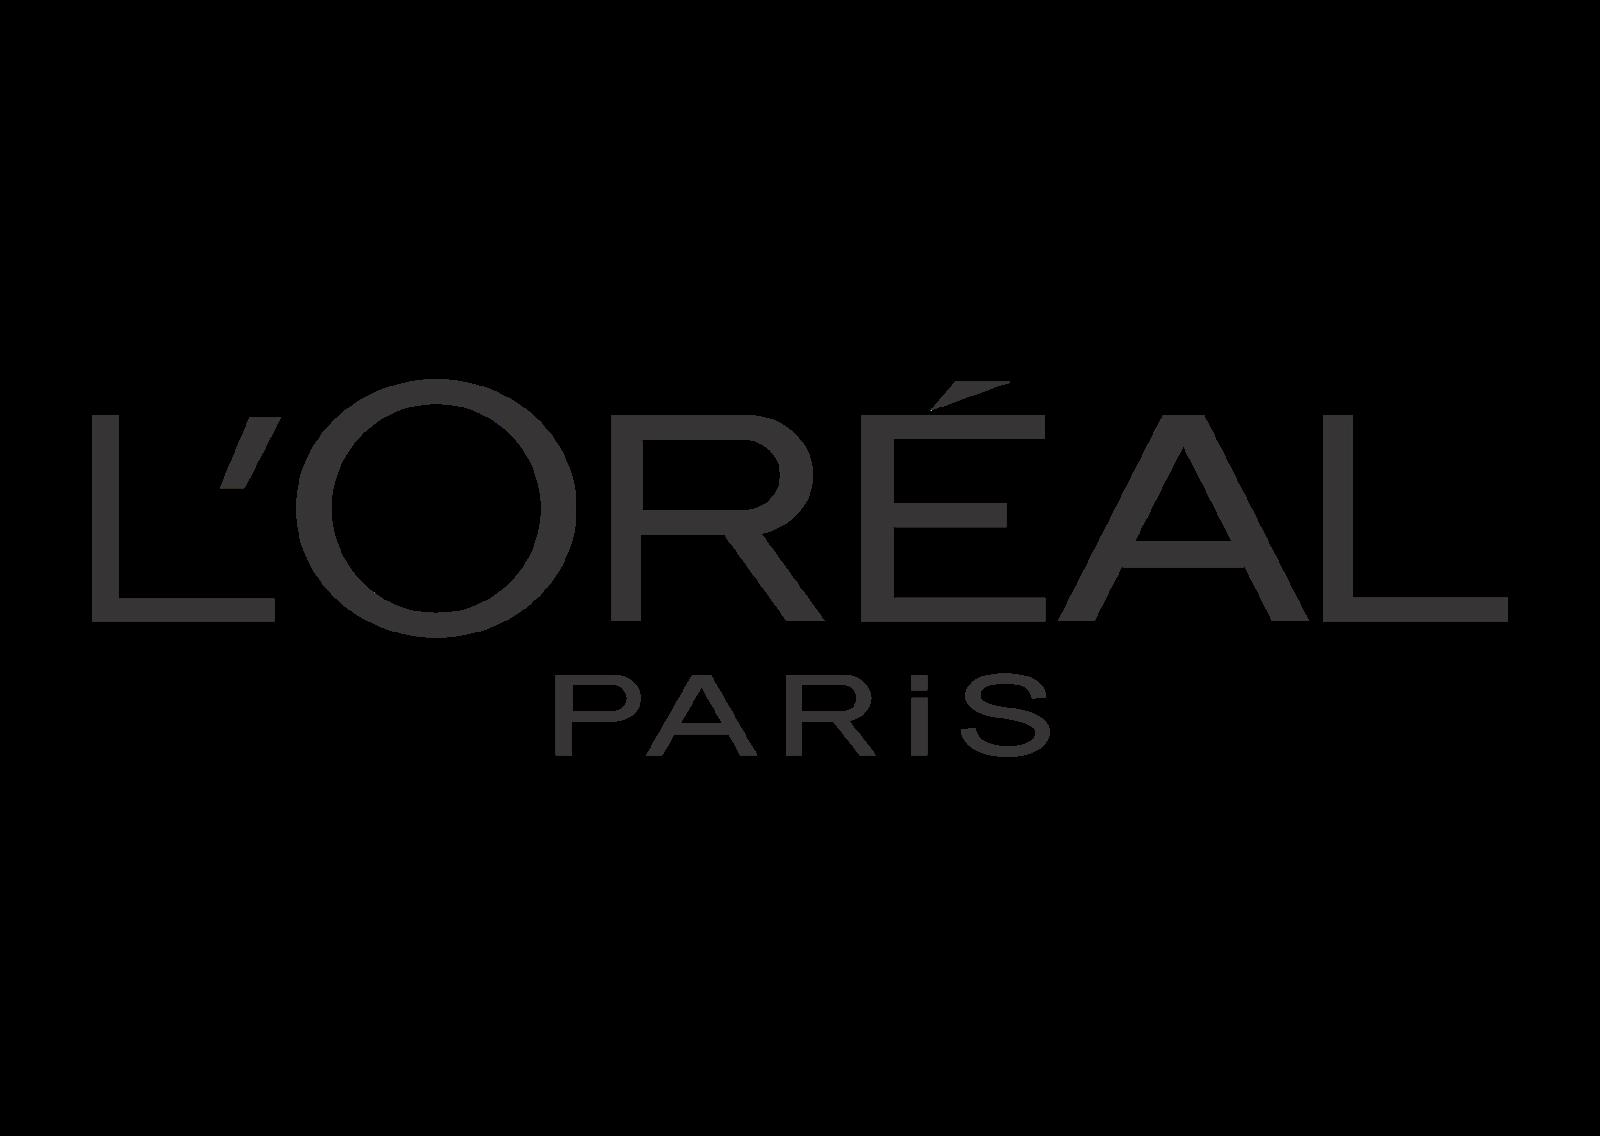 Loreal Logo Wallpaper